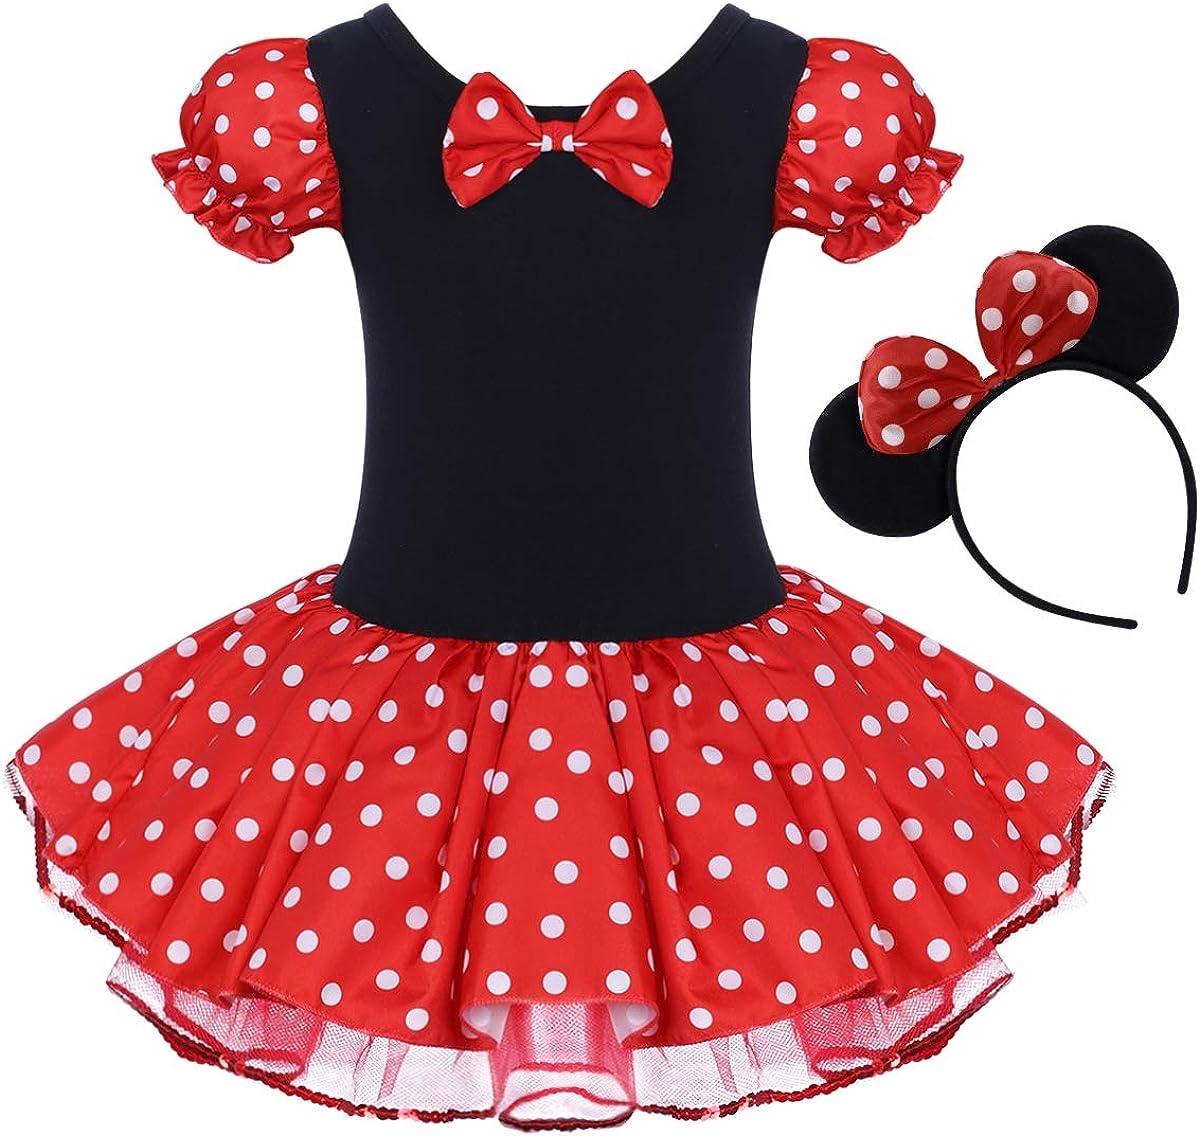 IBTOM CASTLE Toddler Max 74% OFF Girl Polka Dots Tutu Party Dr Costume Fancy Overseas parallel import regular item